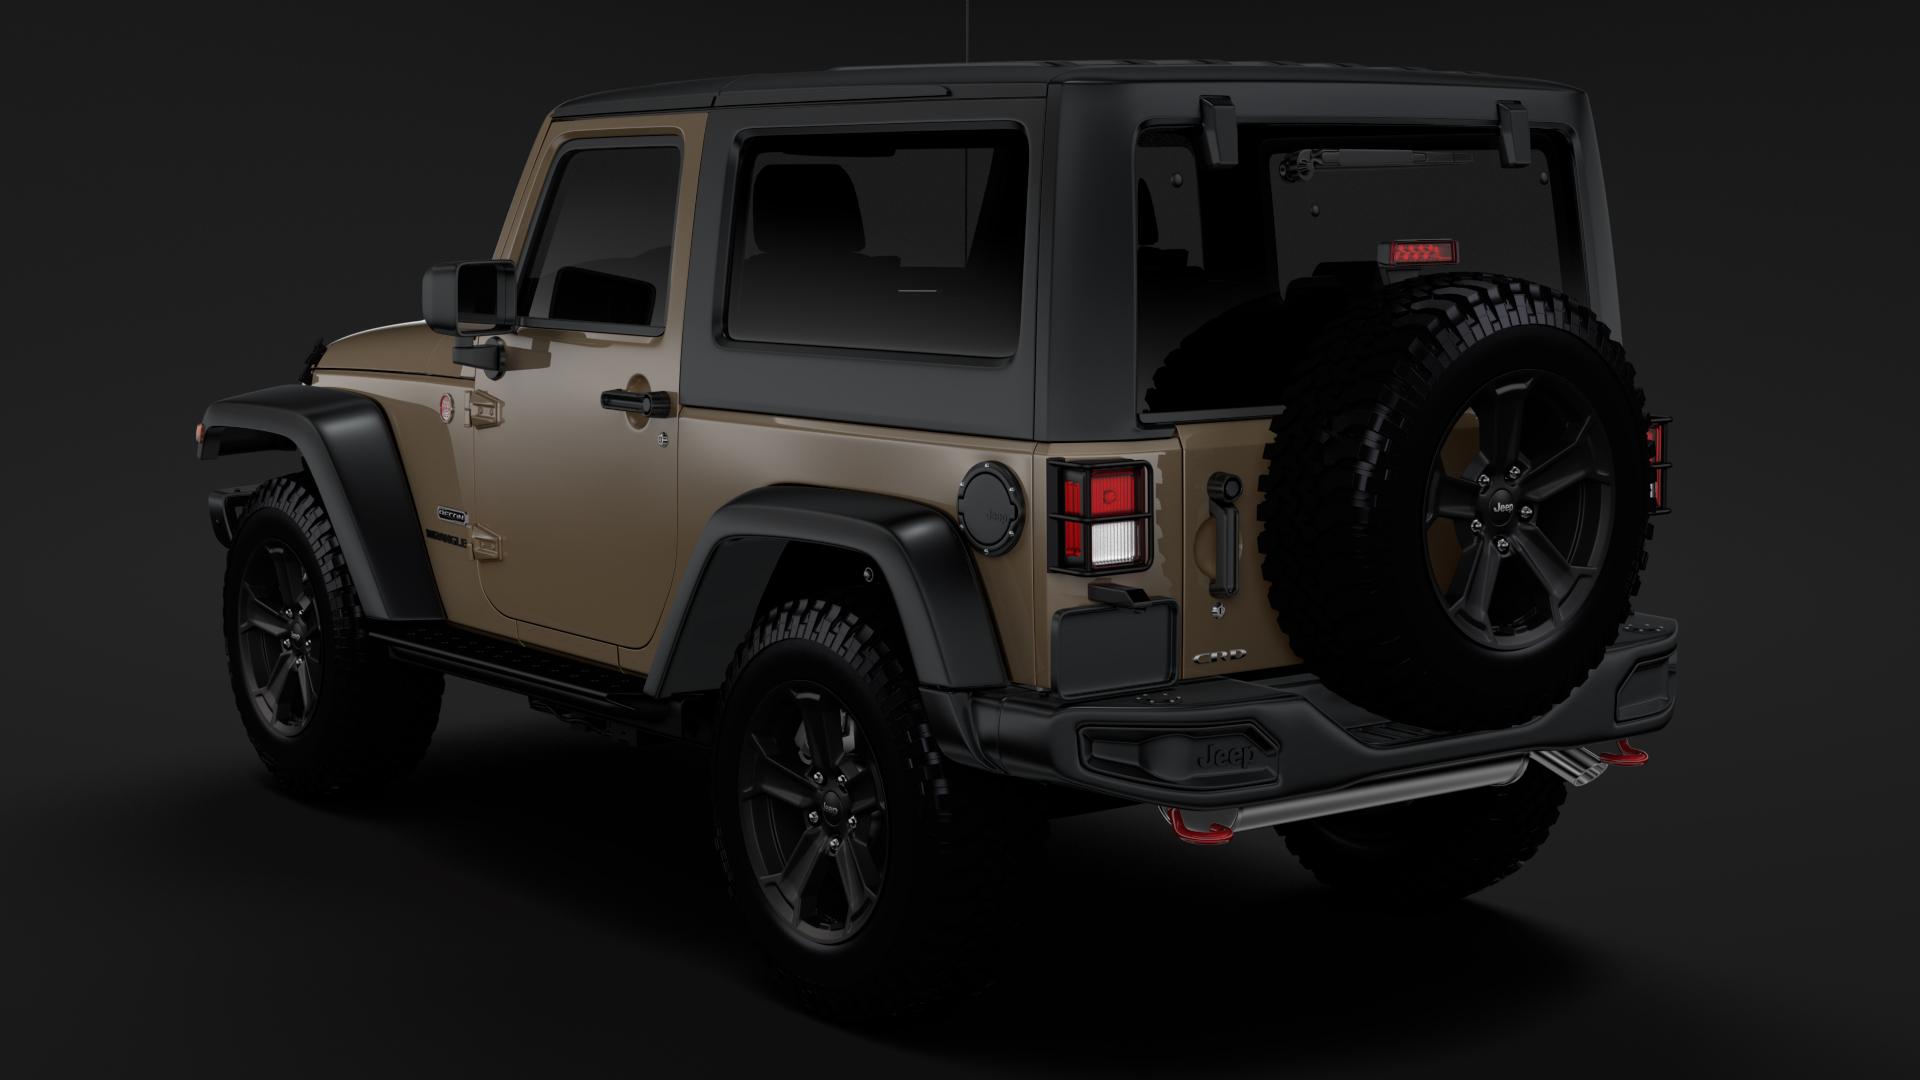 jeep wrangler rubicon recon jk 2017 3d model max fbx lwo ma mb hrc xsi obj 276947